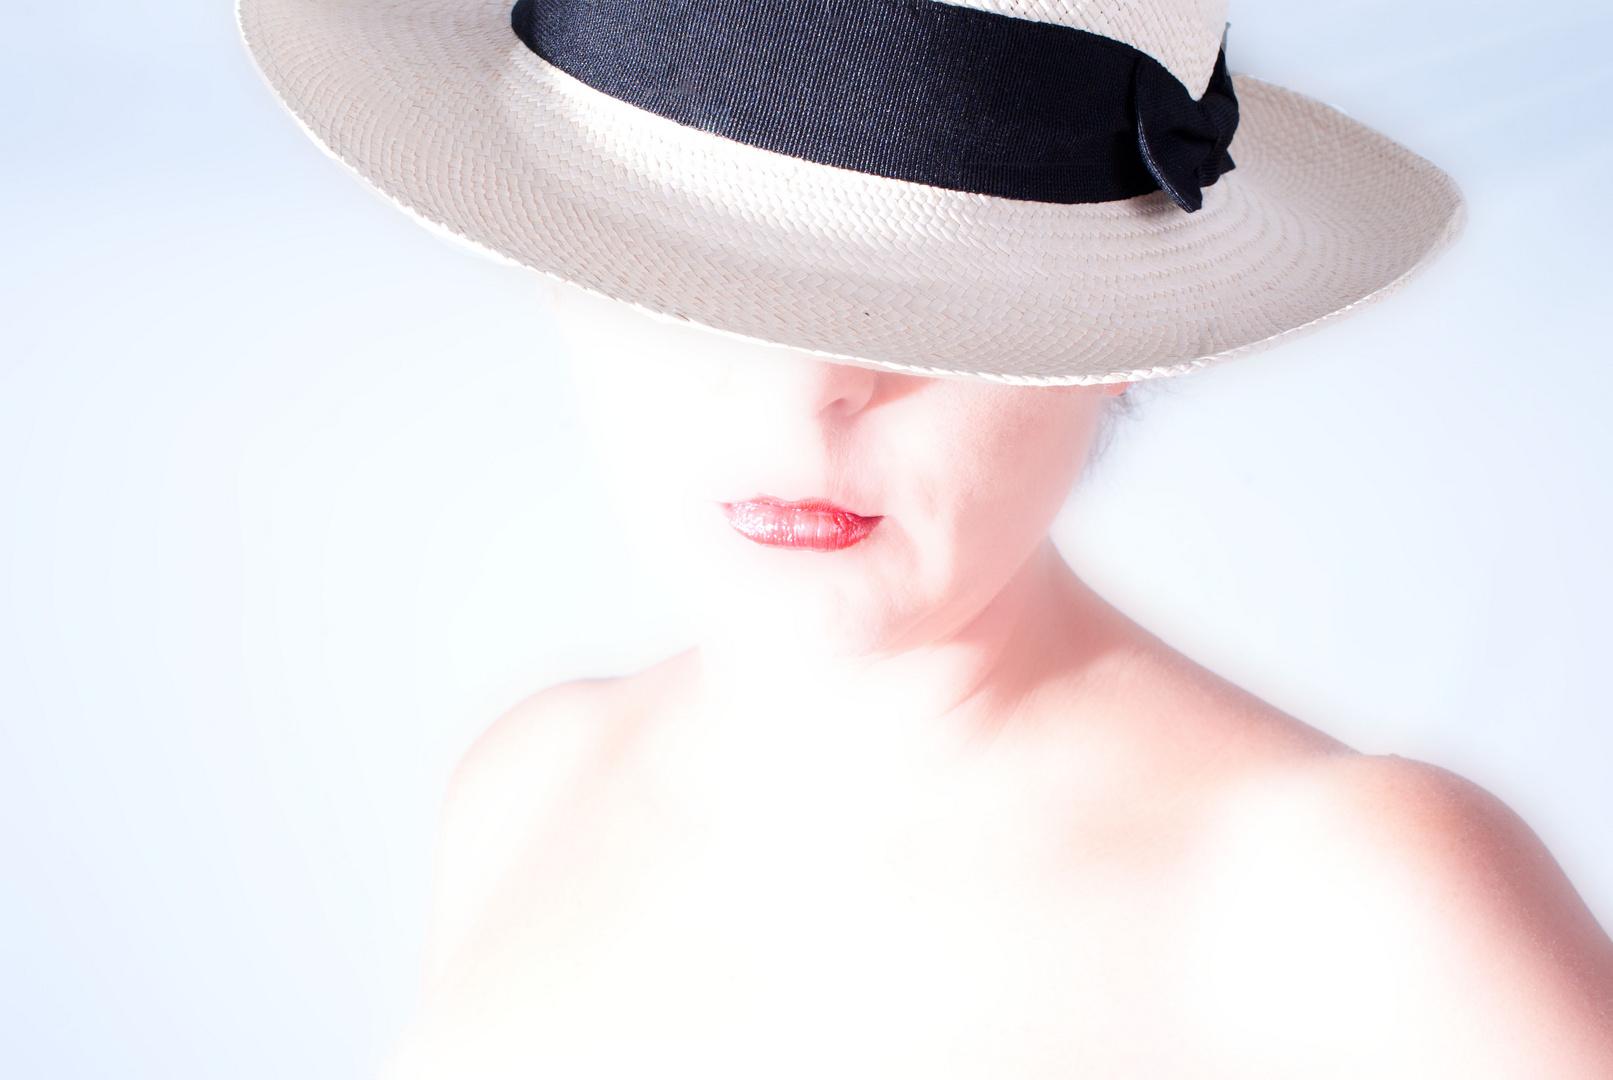 Tina mit Hut